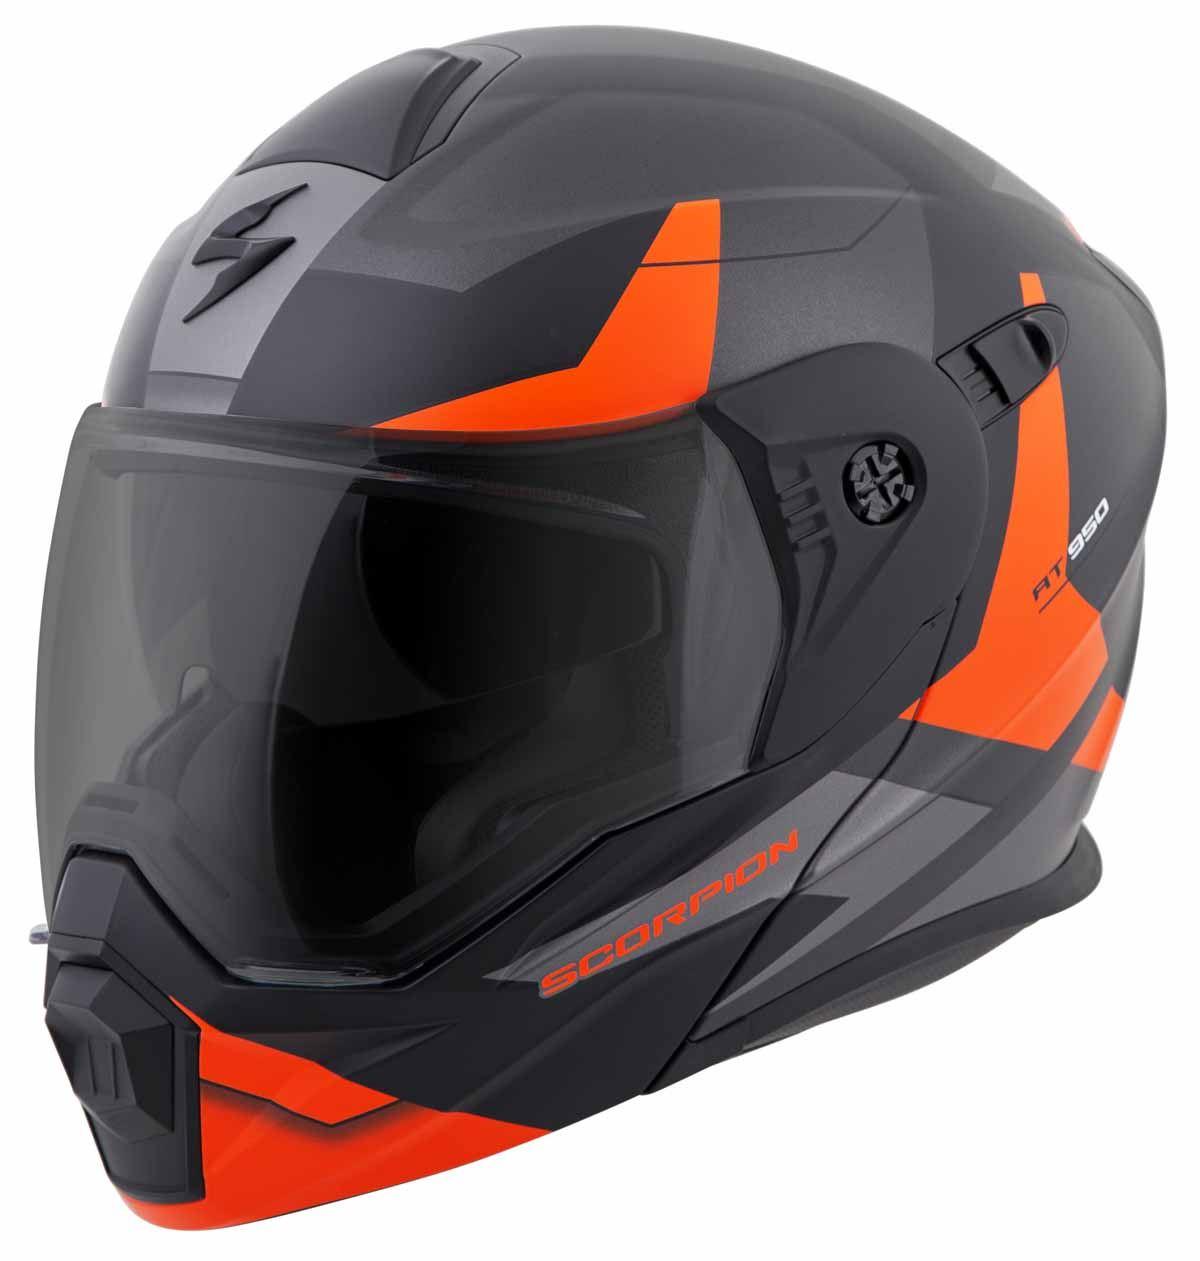 Scorpion-EXO-AT950-Helmet-Flip-Up-Modular-Dual-Sport-Adventure-ADV-DOT-XS-3XL miniature 49